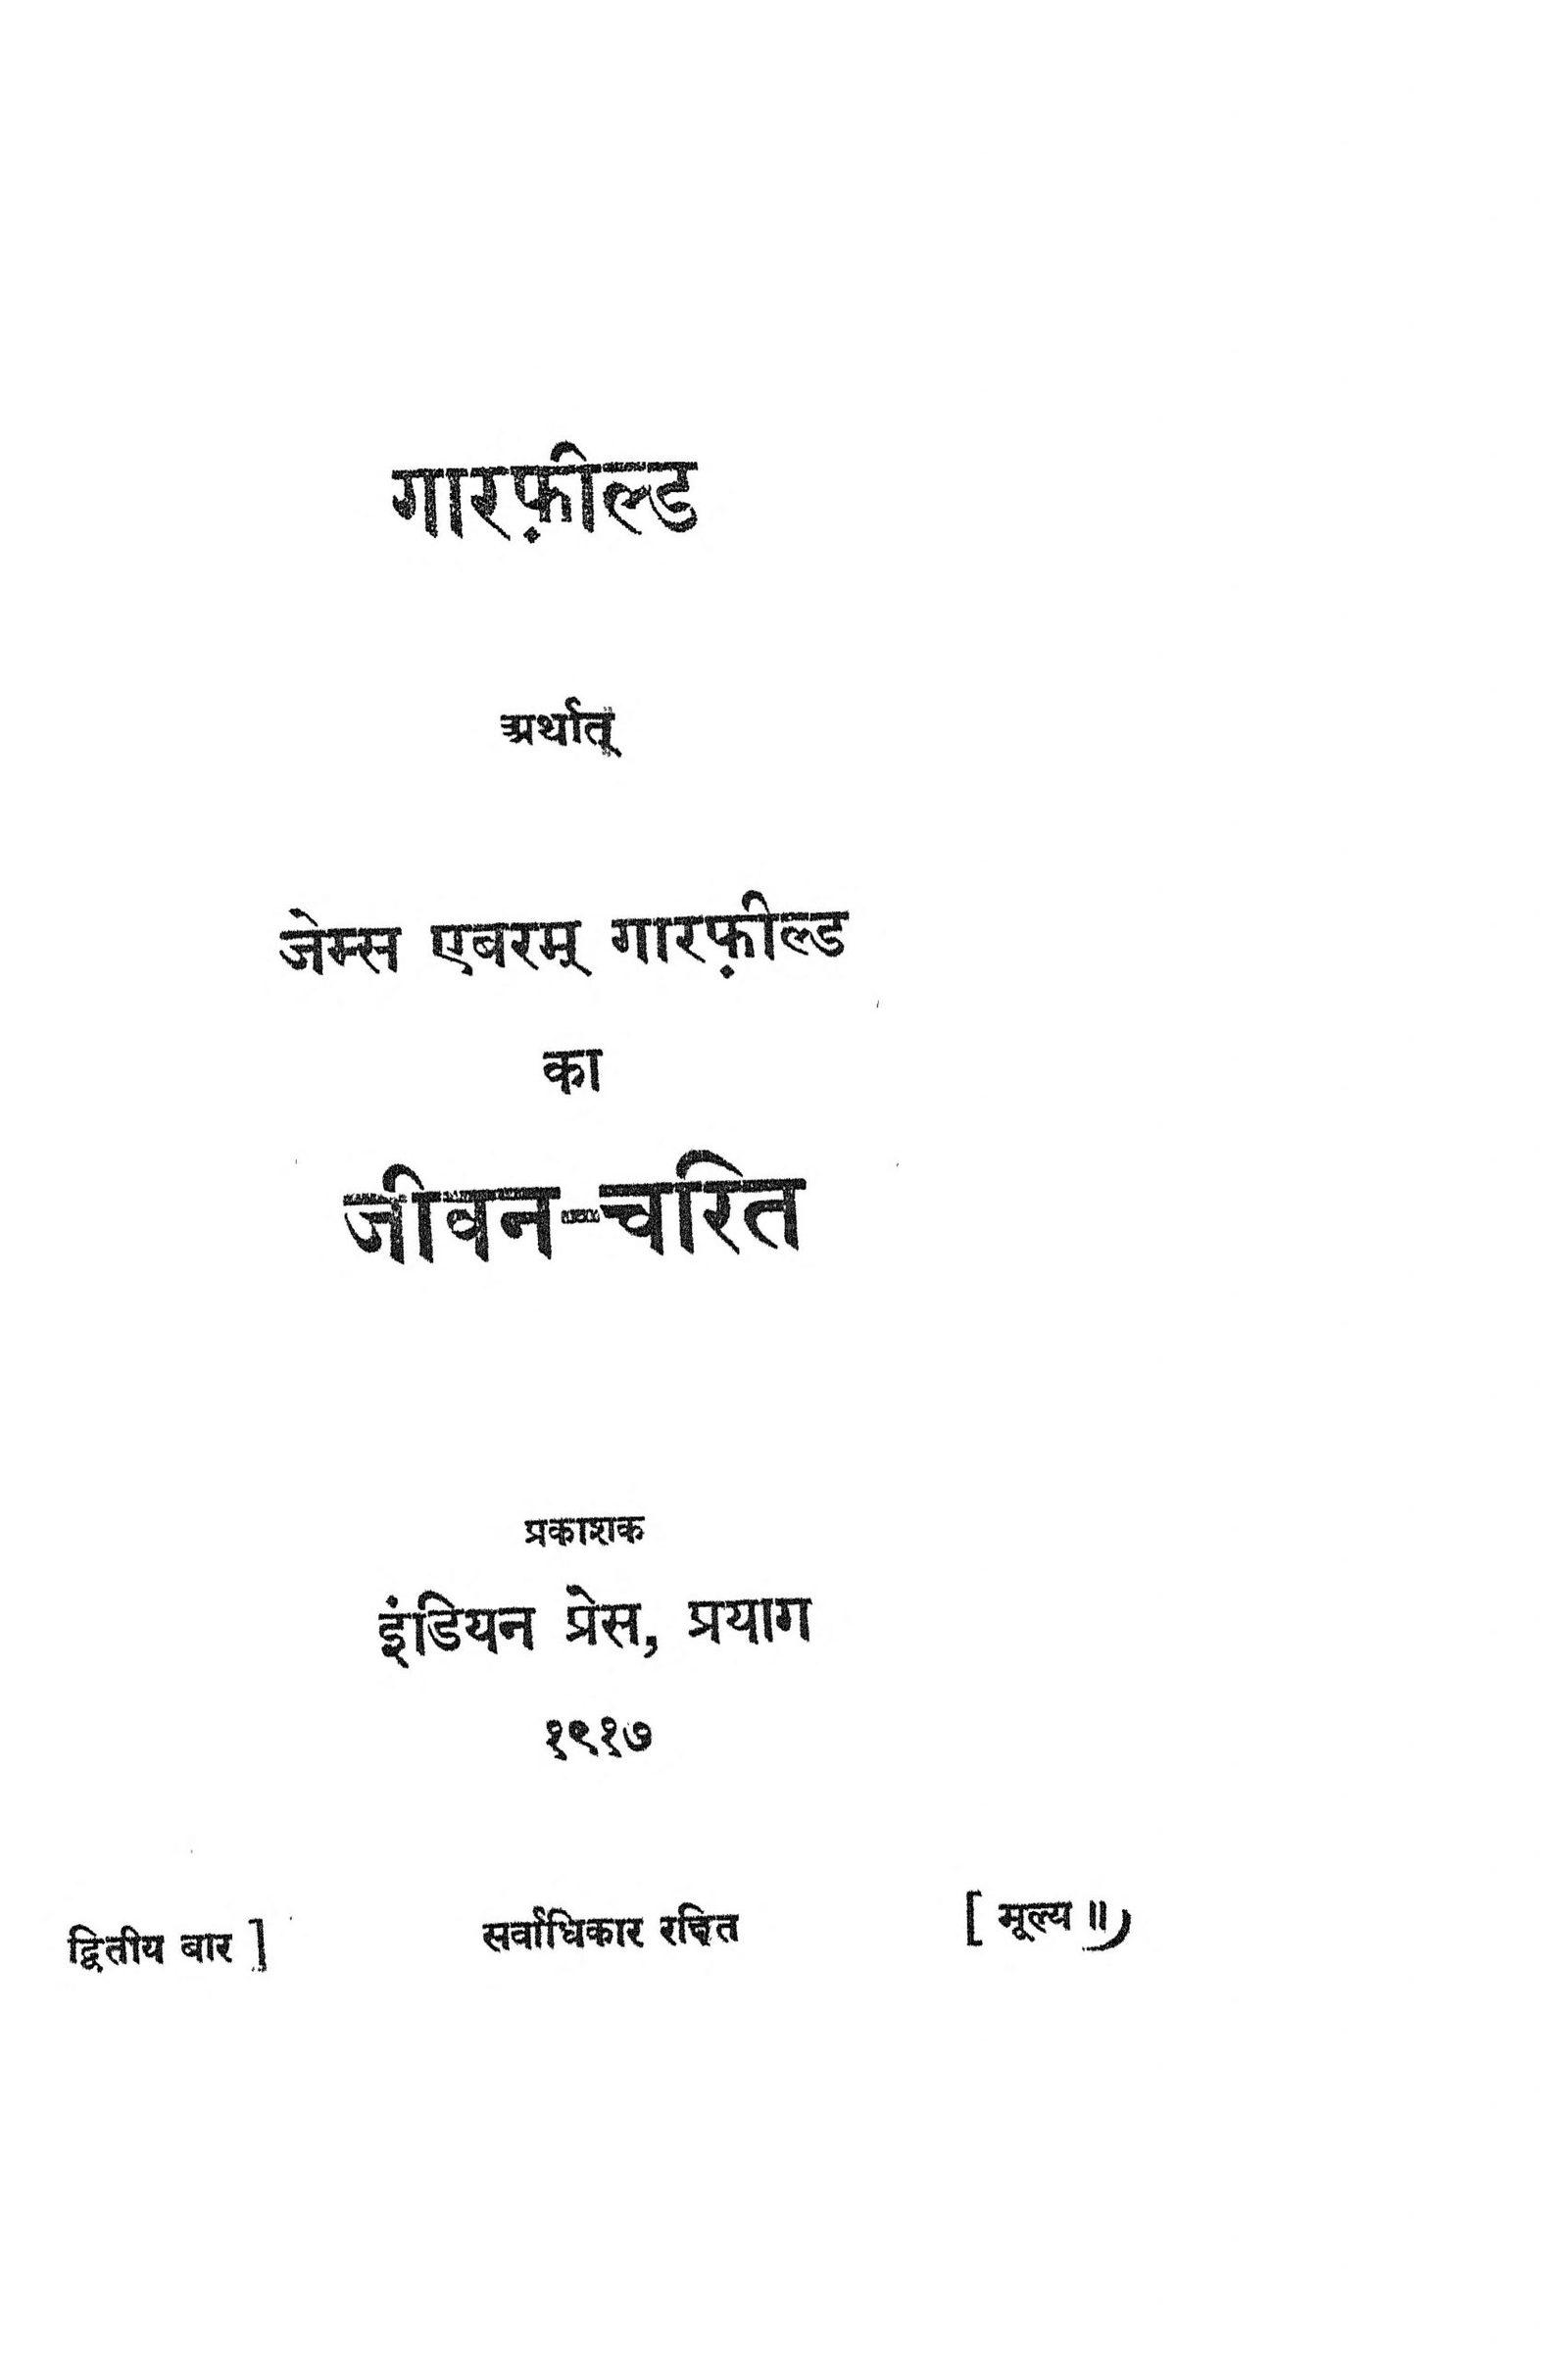 Garfield Or James Aberam Garfield Ka Jivan-charitra by जेम्स एवरम् गारफील्ड - James Evram Garfield